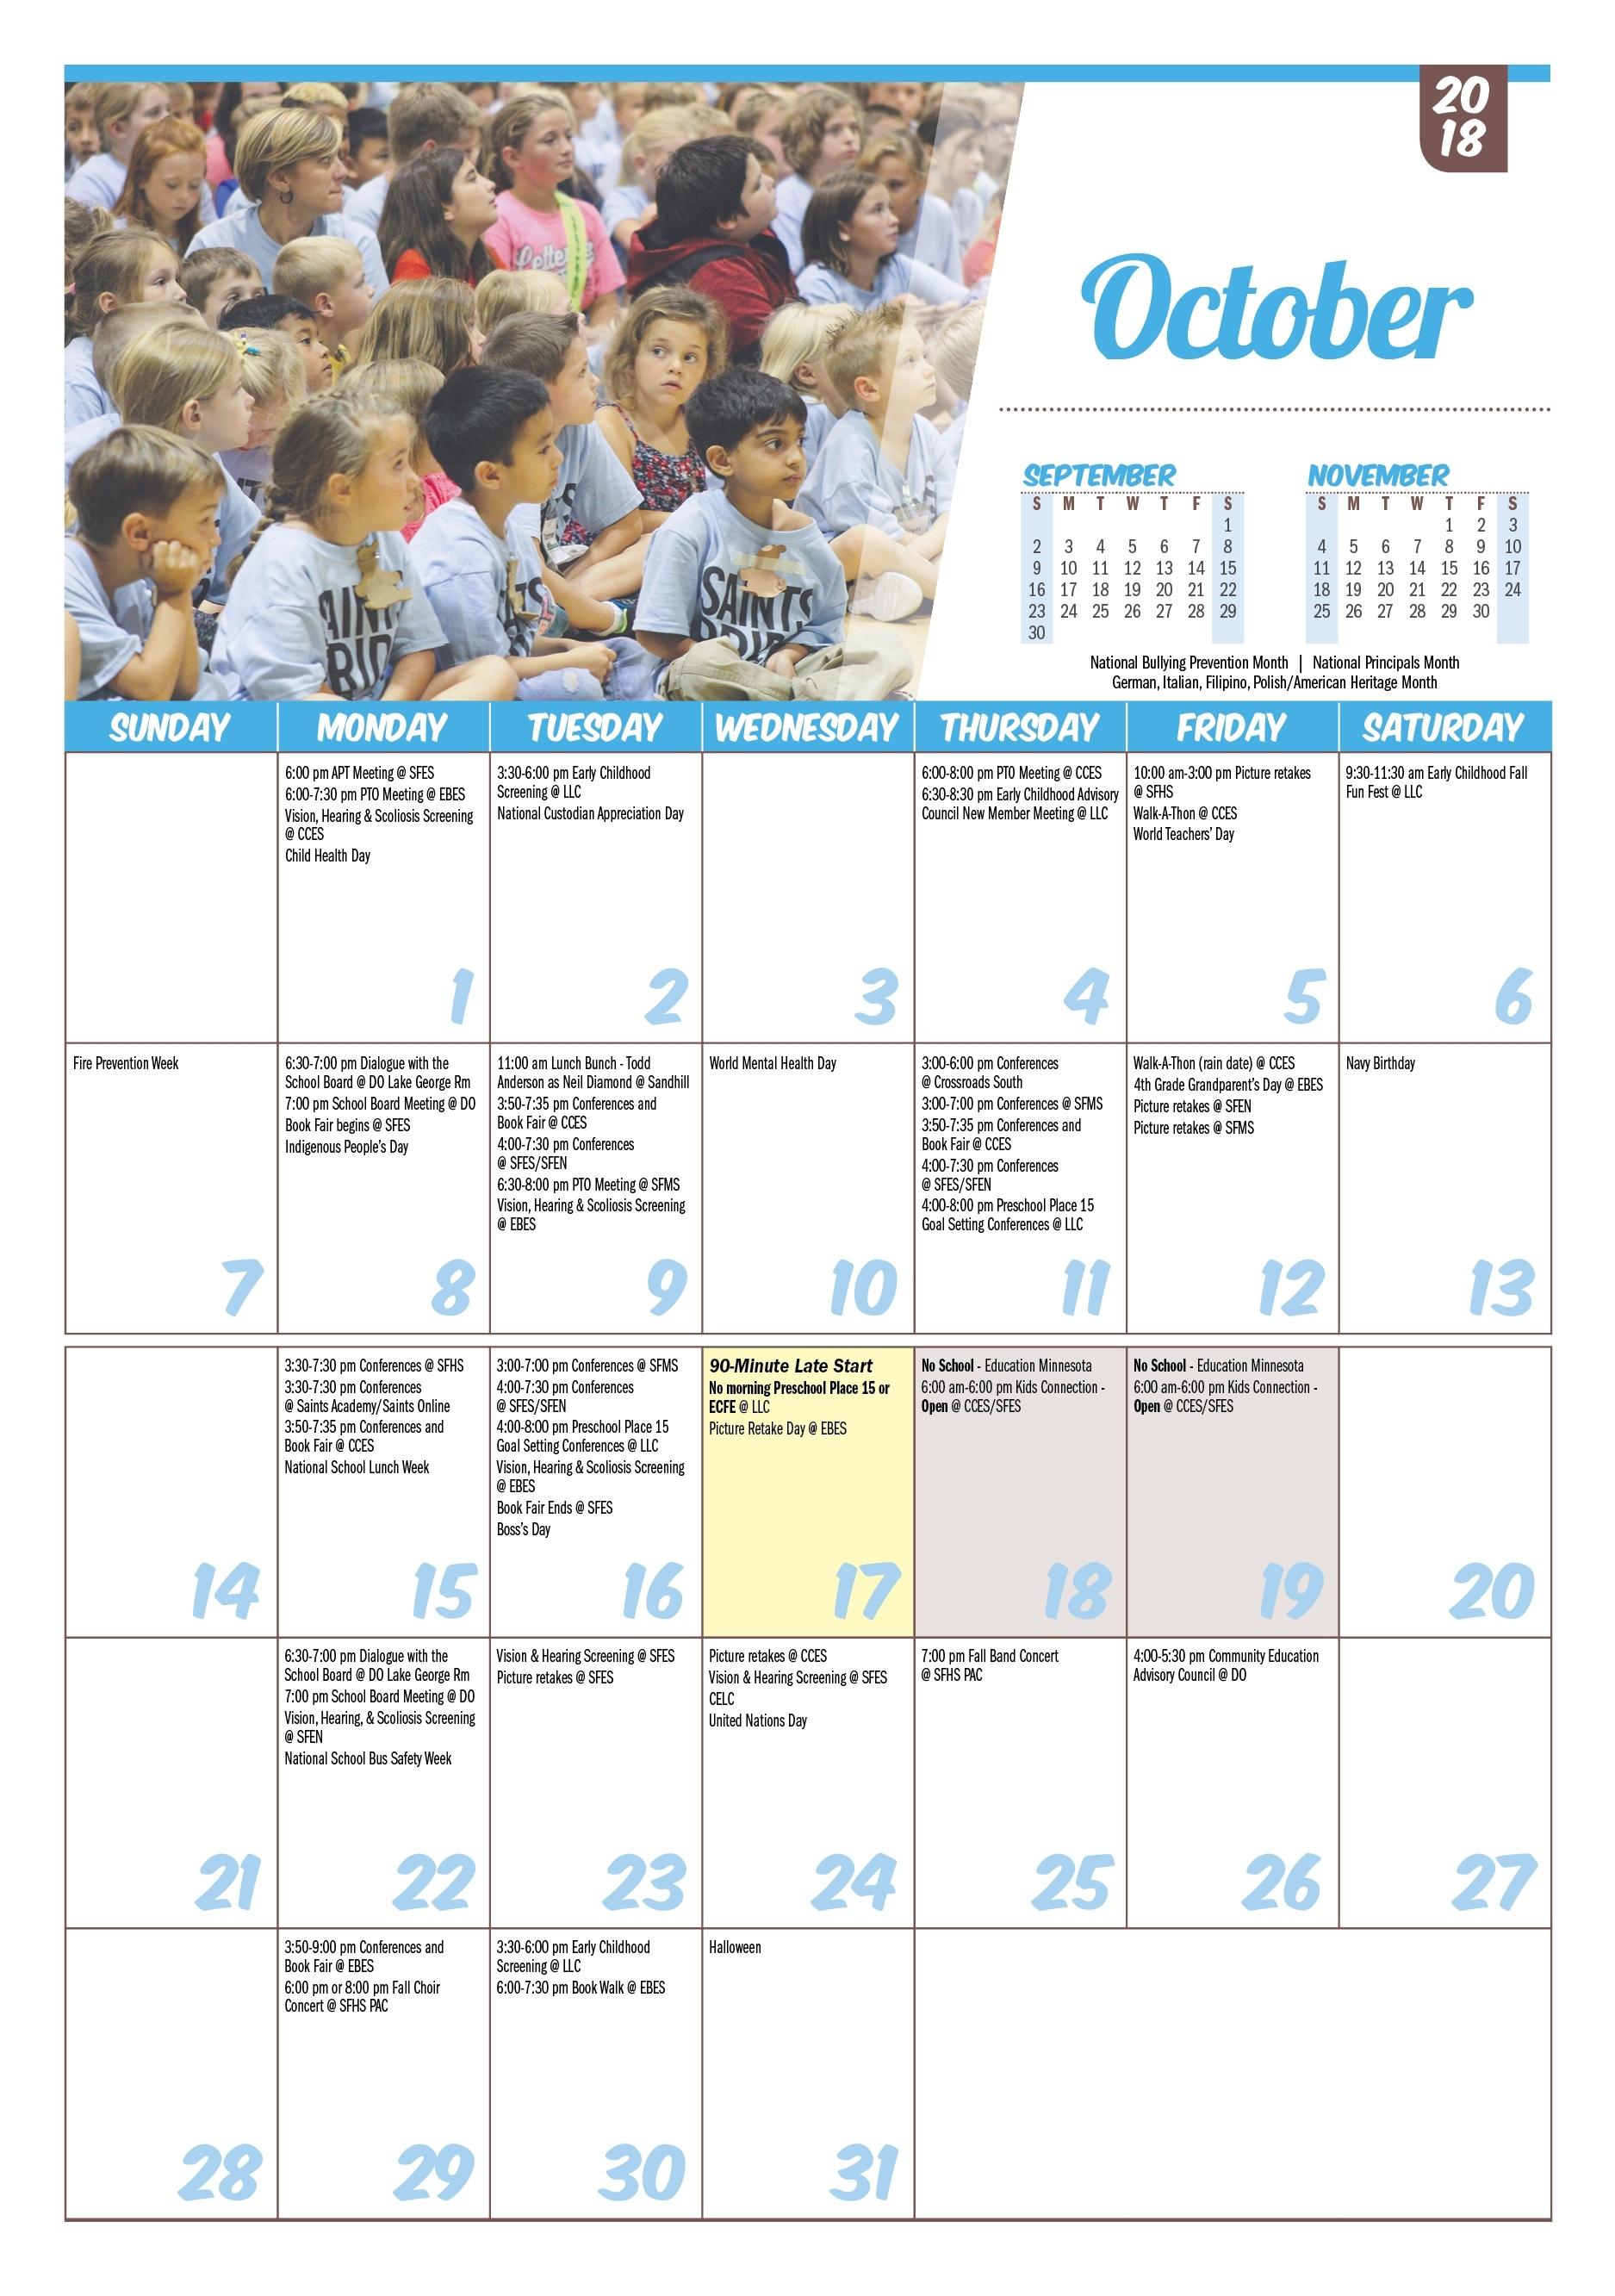 Isd 15, St. Francis: Printable Calendars Anderson 2 School Calendar